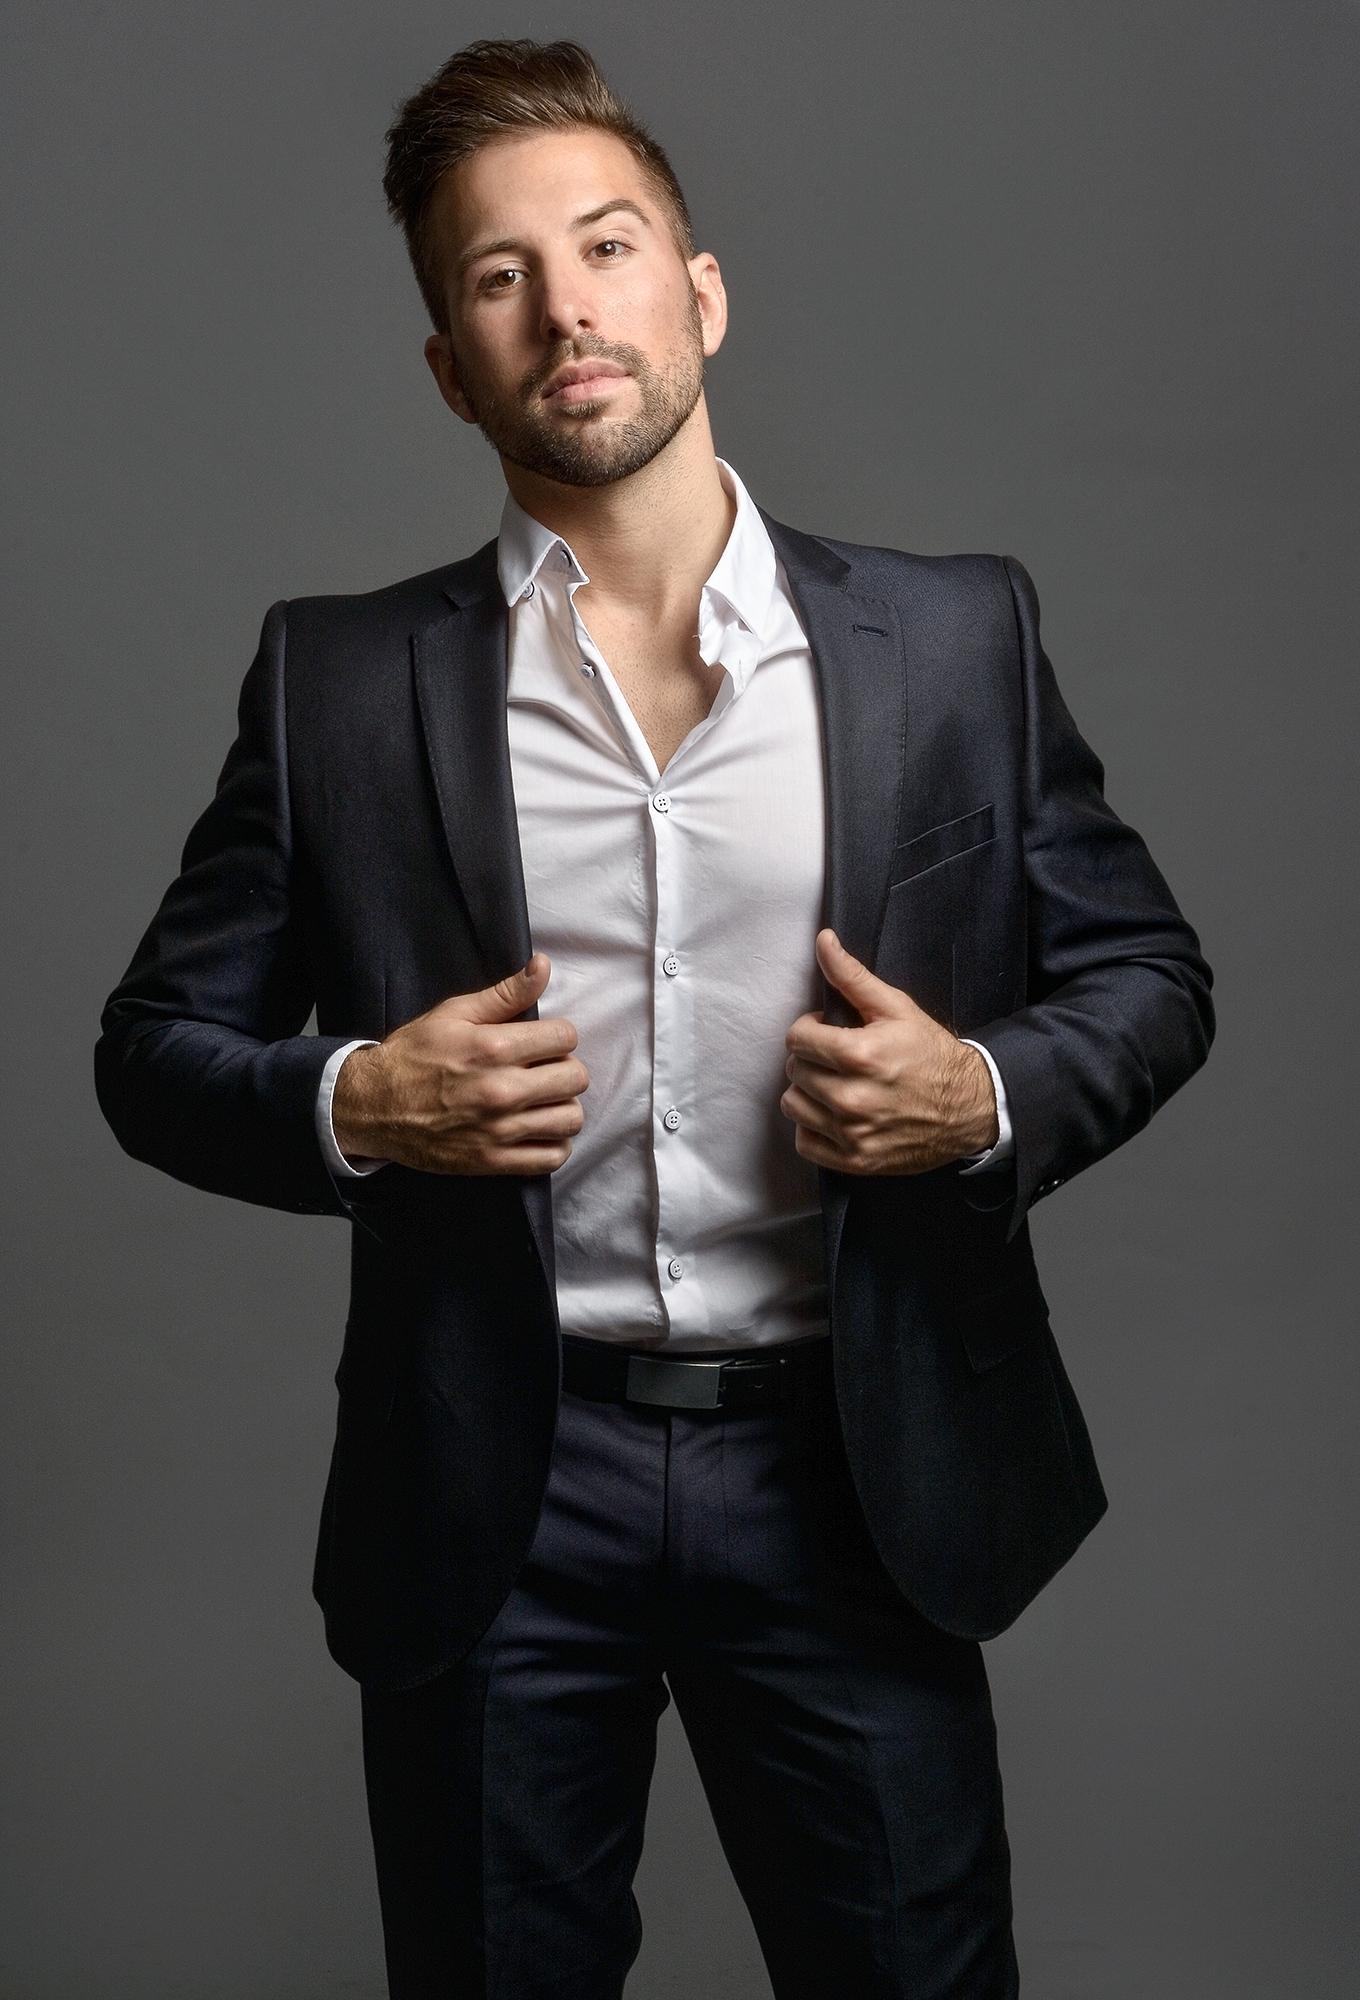 Sergio Ramos Lookalike (UK) - Lookalikes